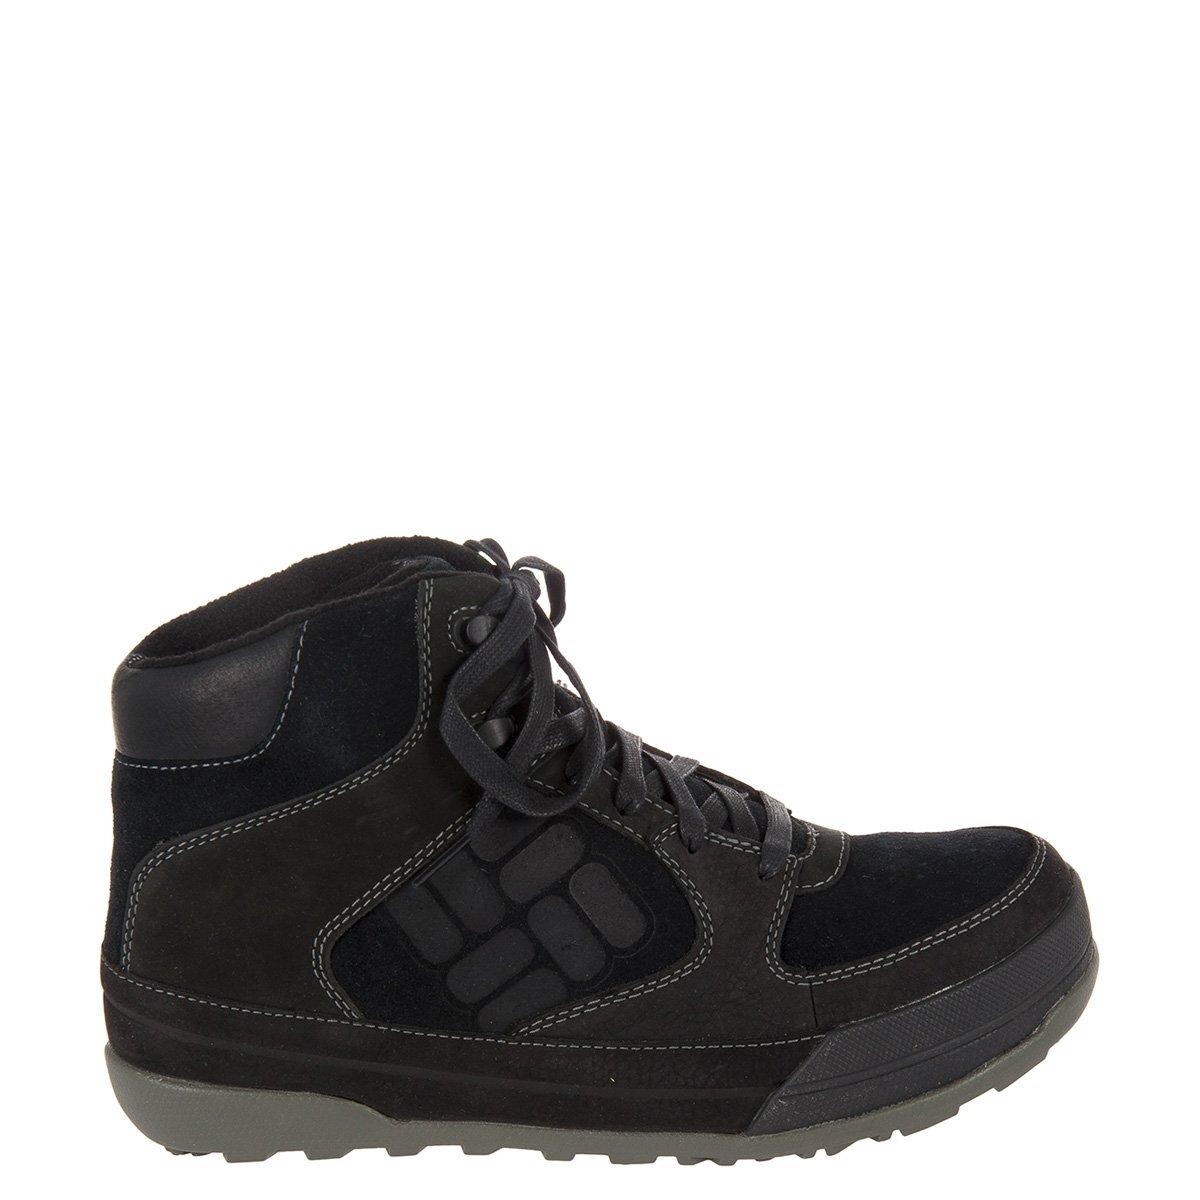 502513224928 Pánska čierna zimná obuv Columbia